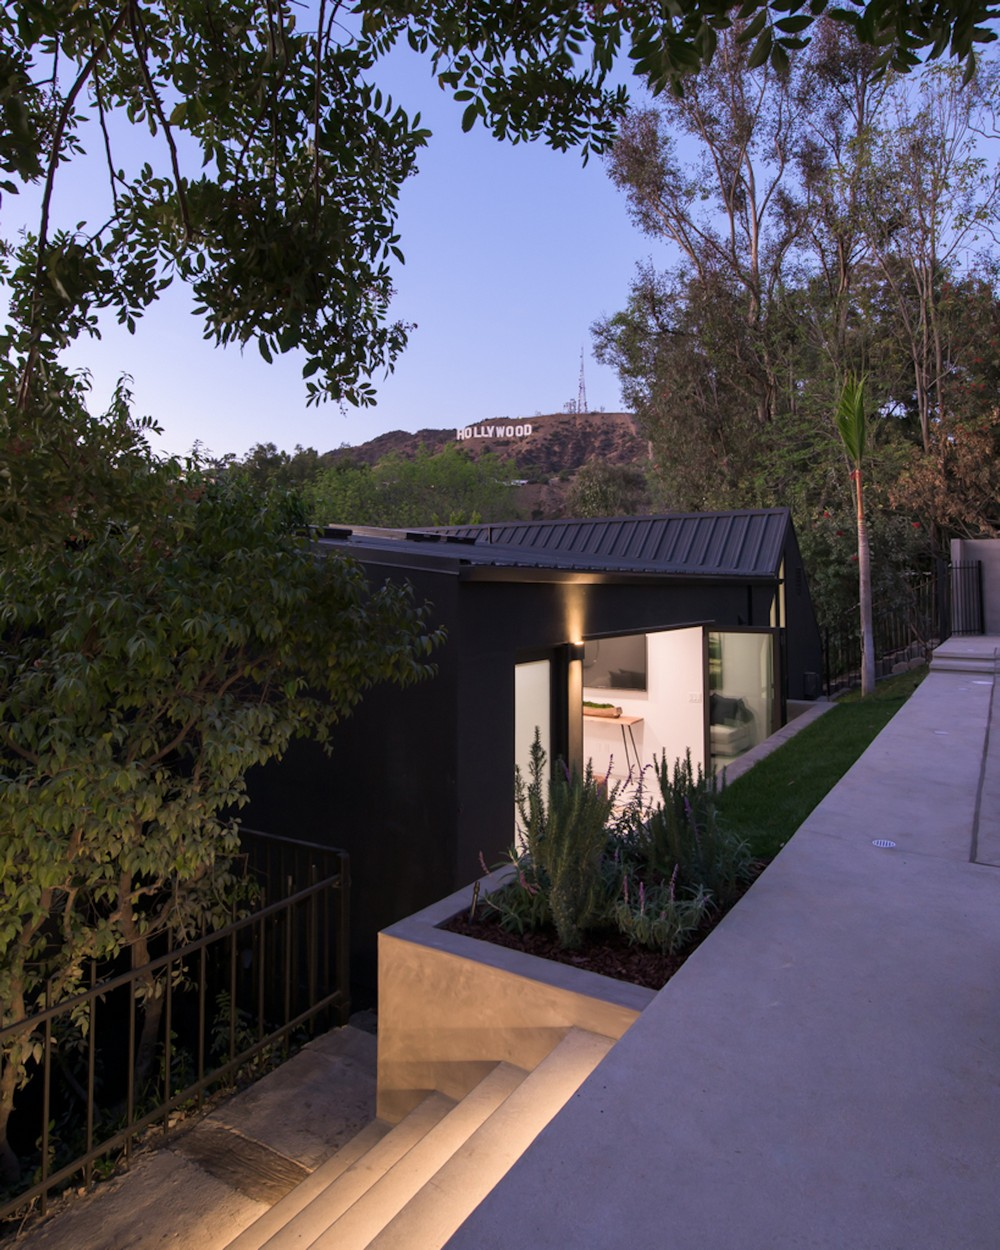 Реконструкция особняка на Голливудских холмах